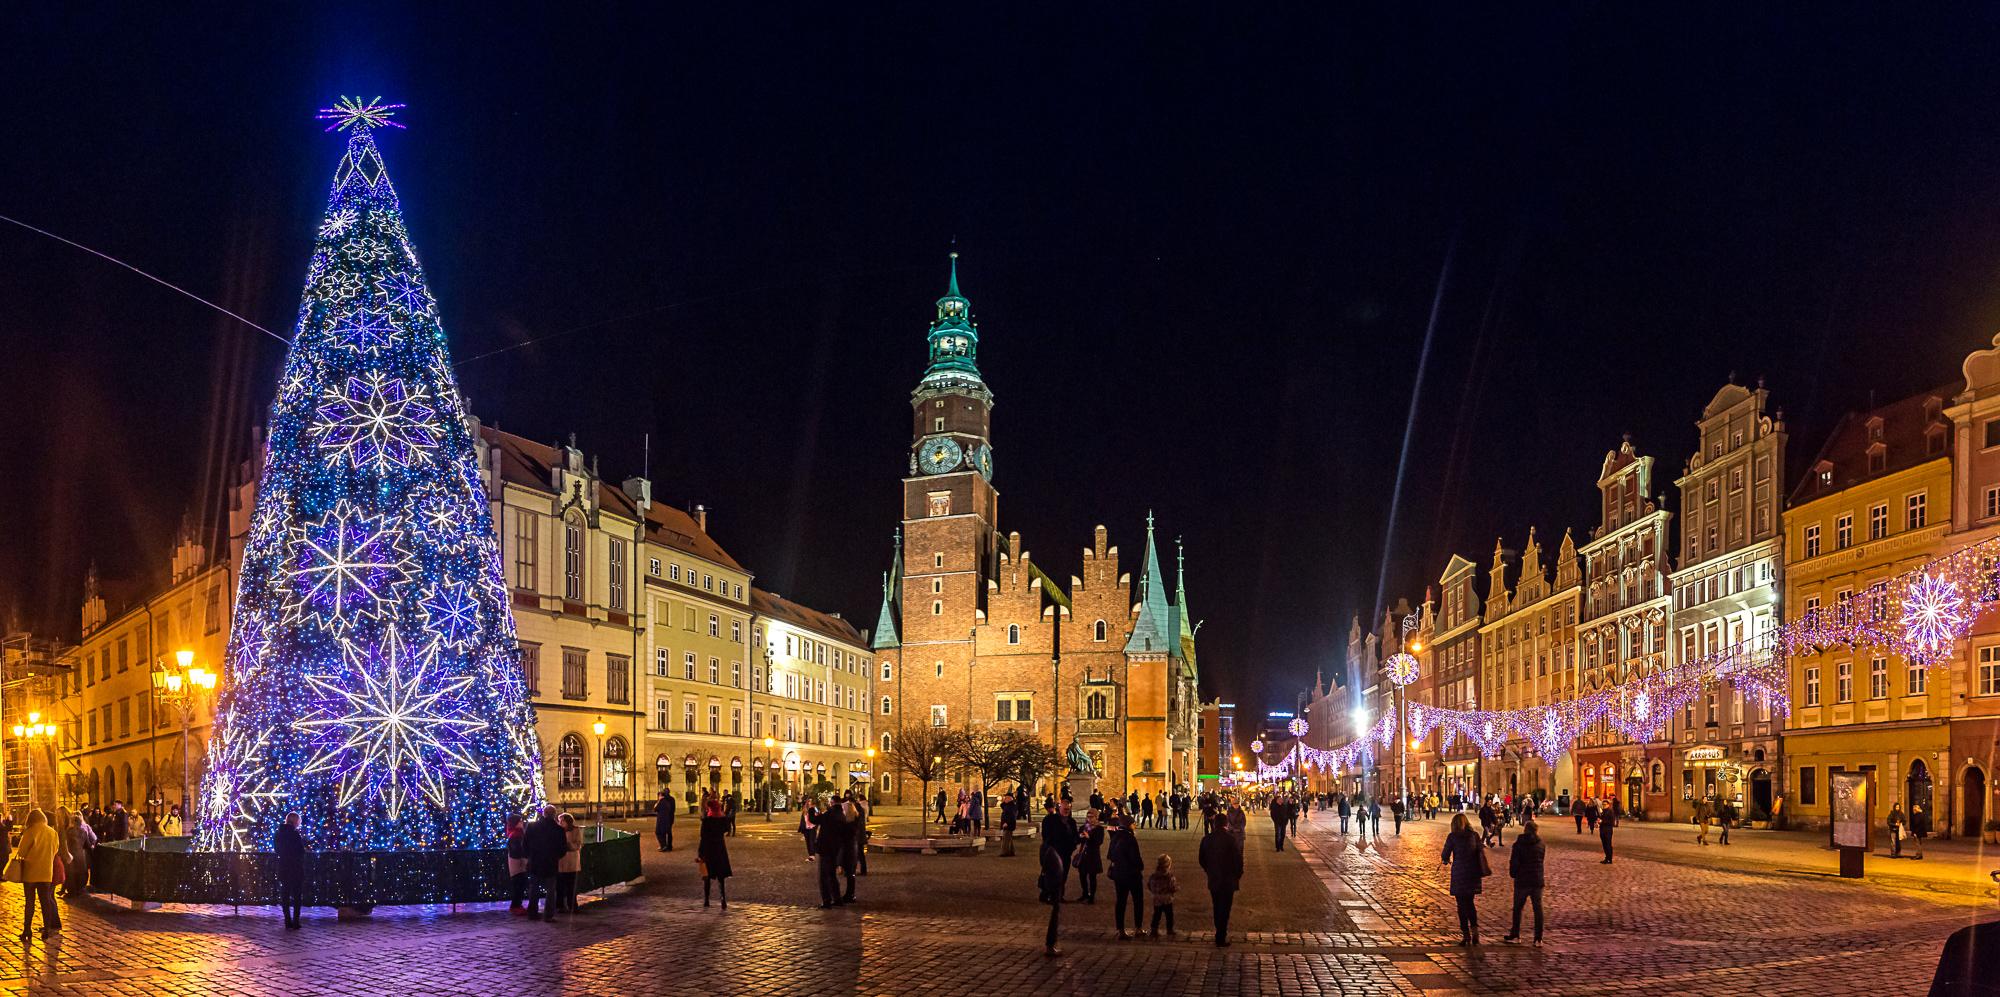 Le panorama festif de centre-ville de Wroclaw